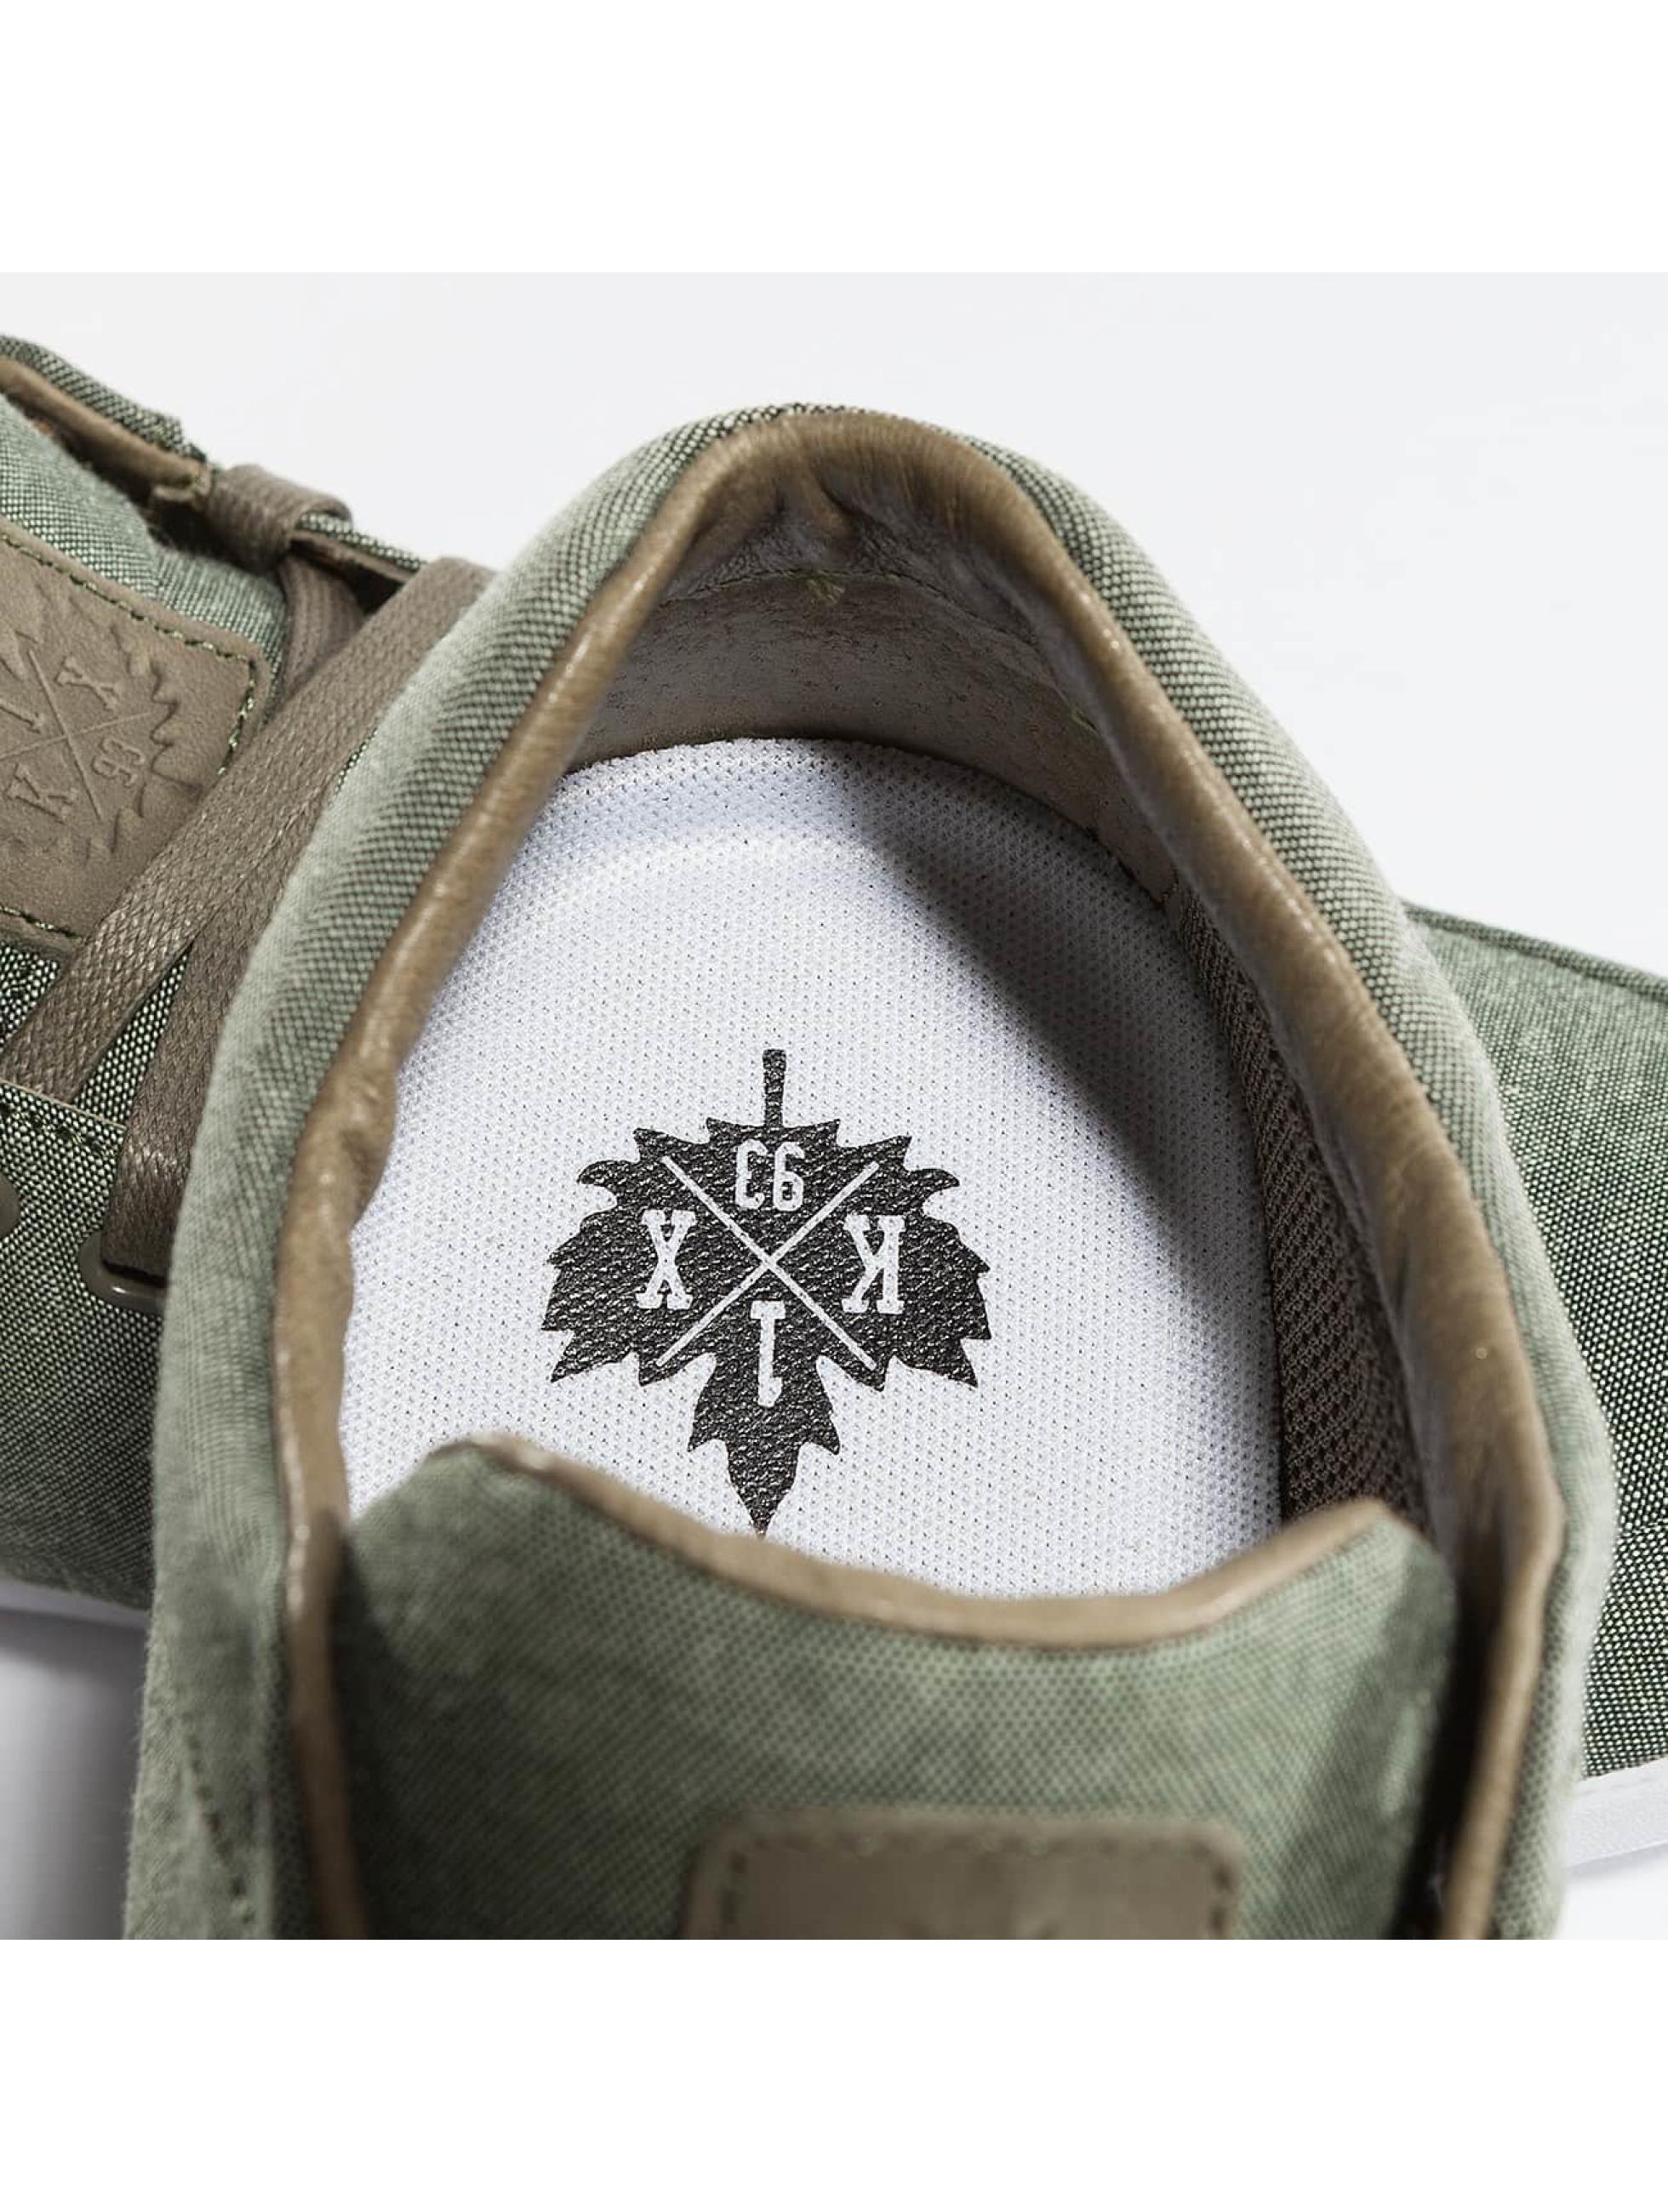 K1X Sneakers LP Low olivová